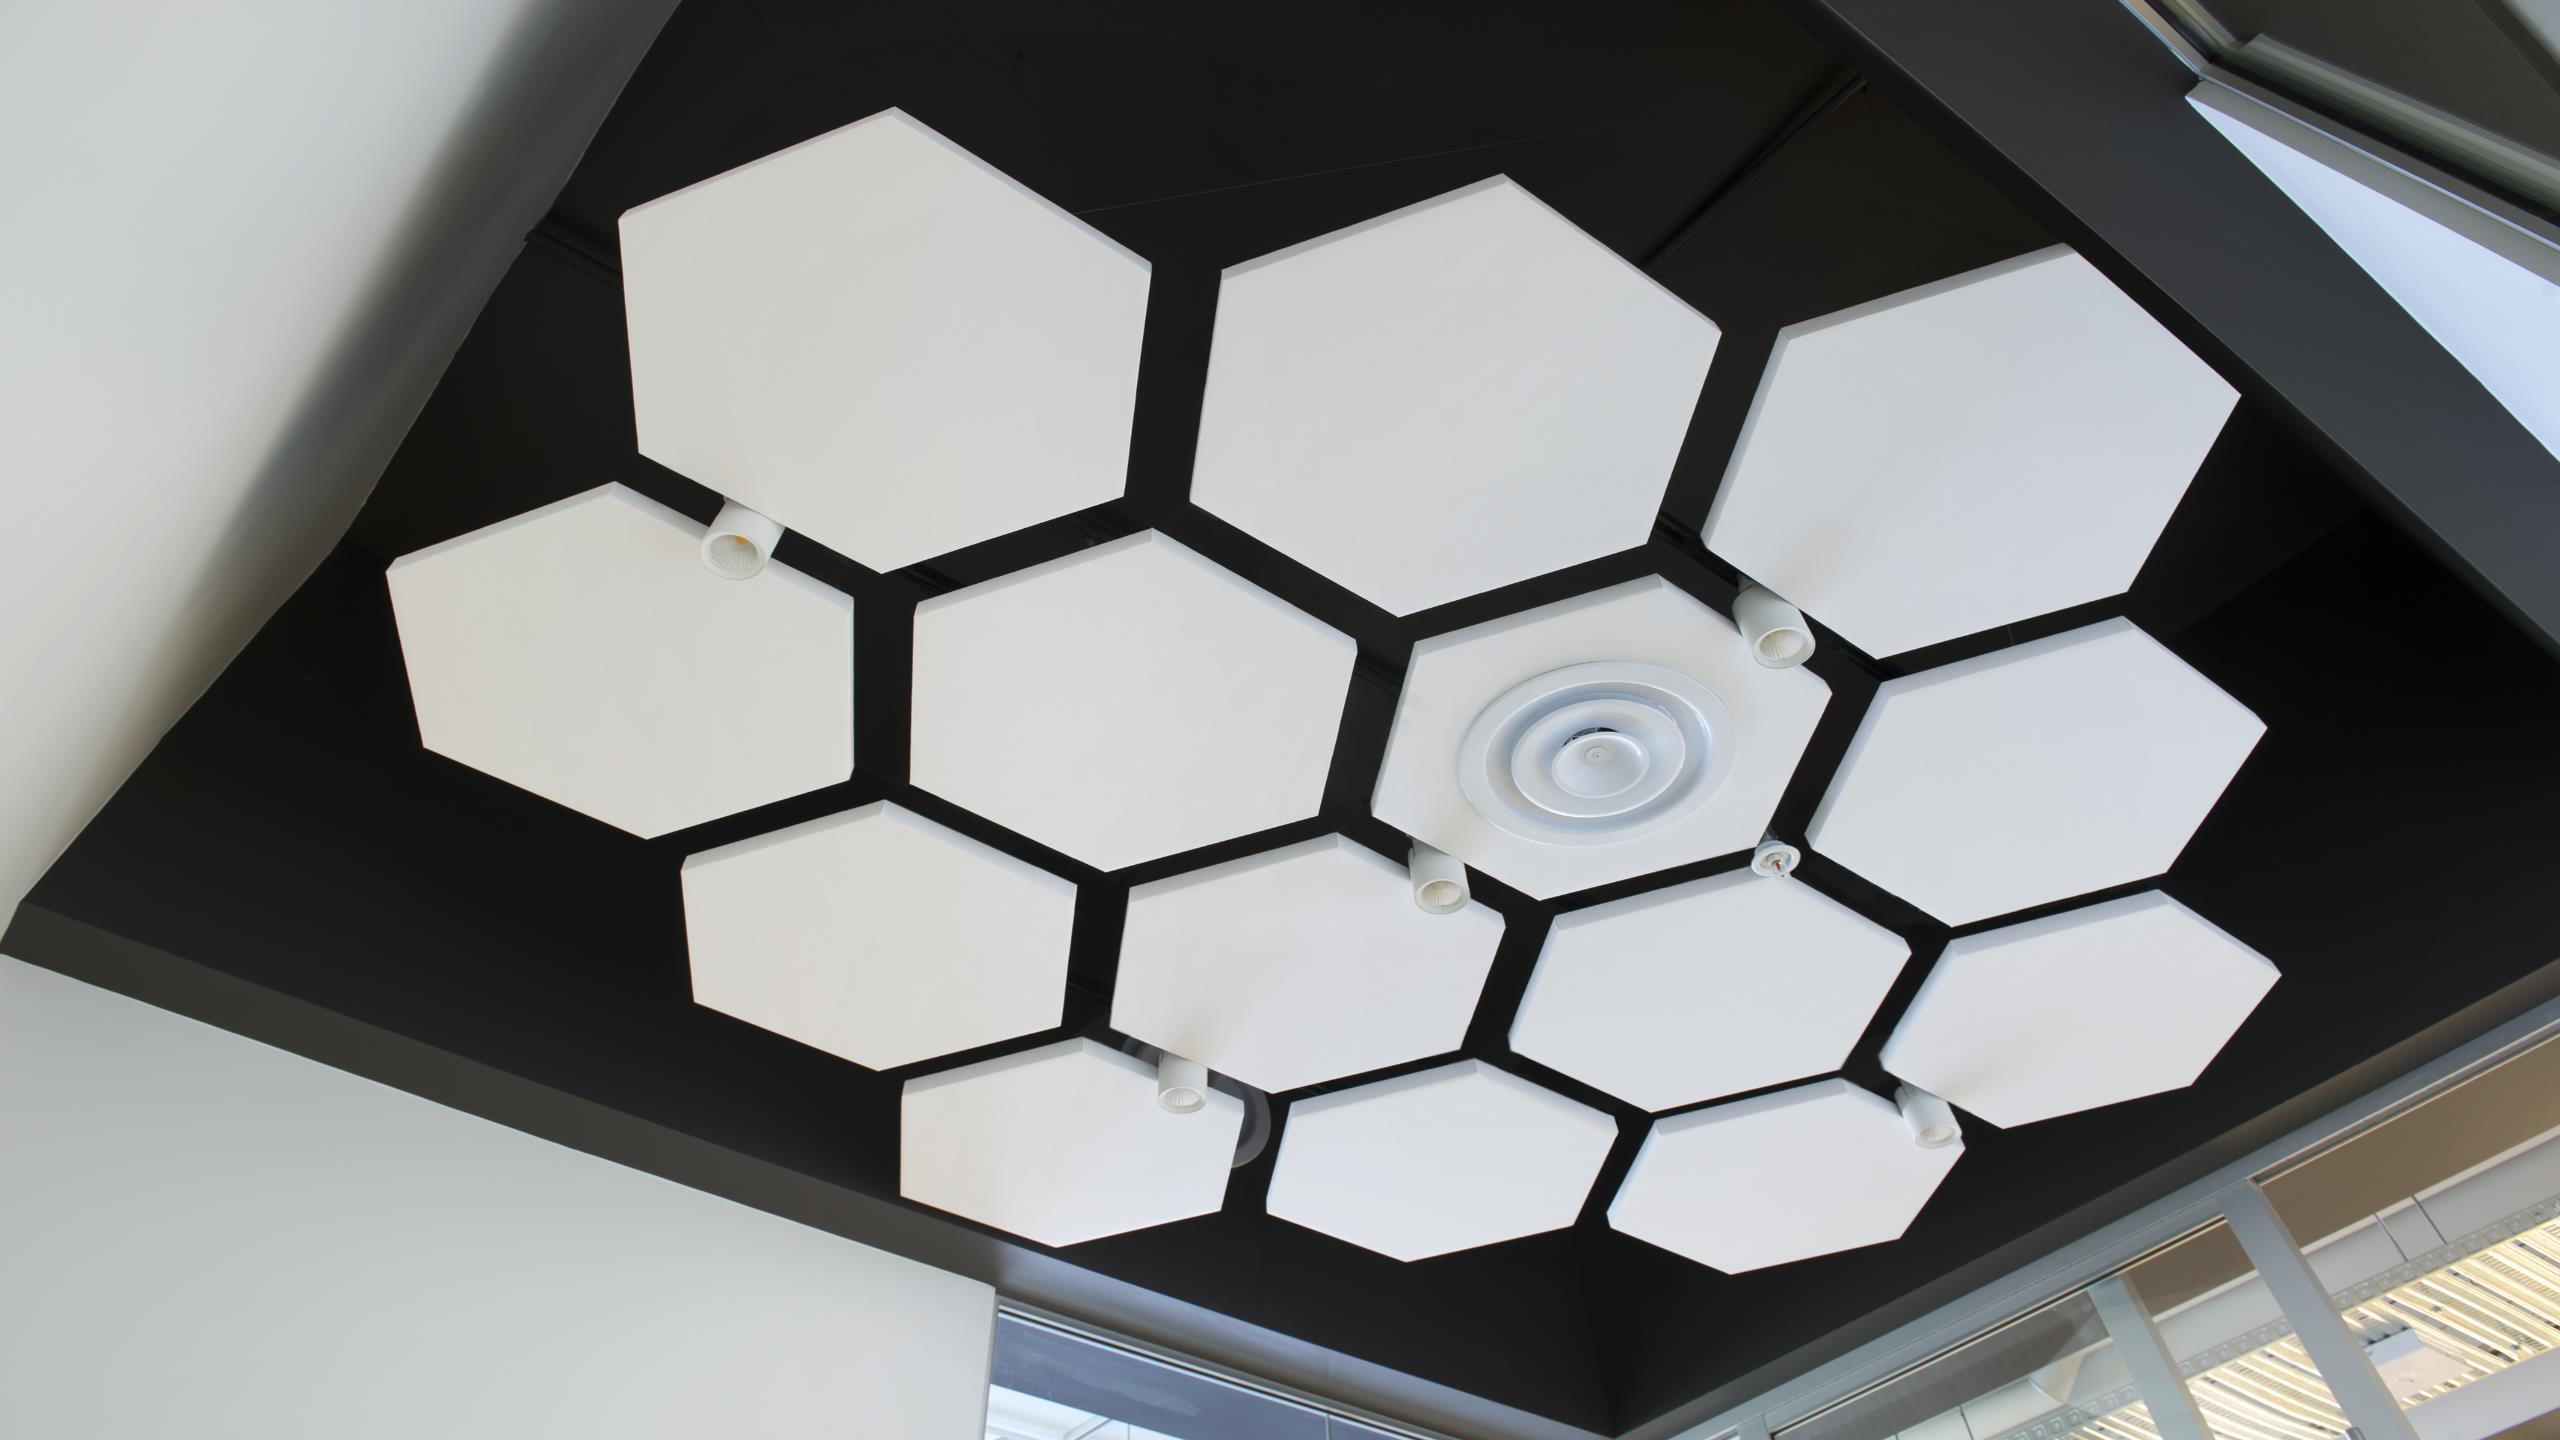 Triton Cloud Shapes Products Asona